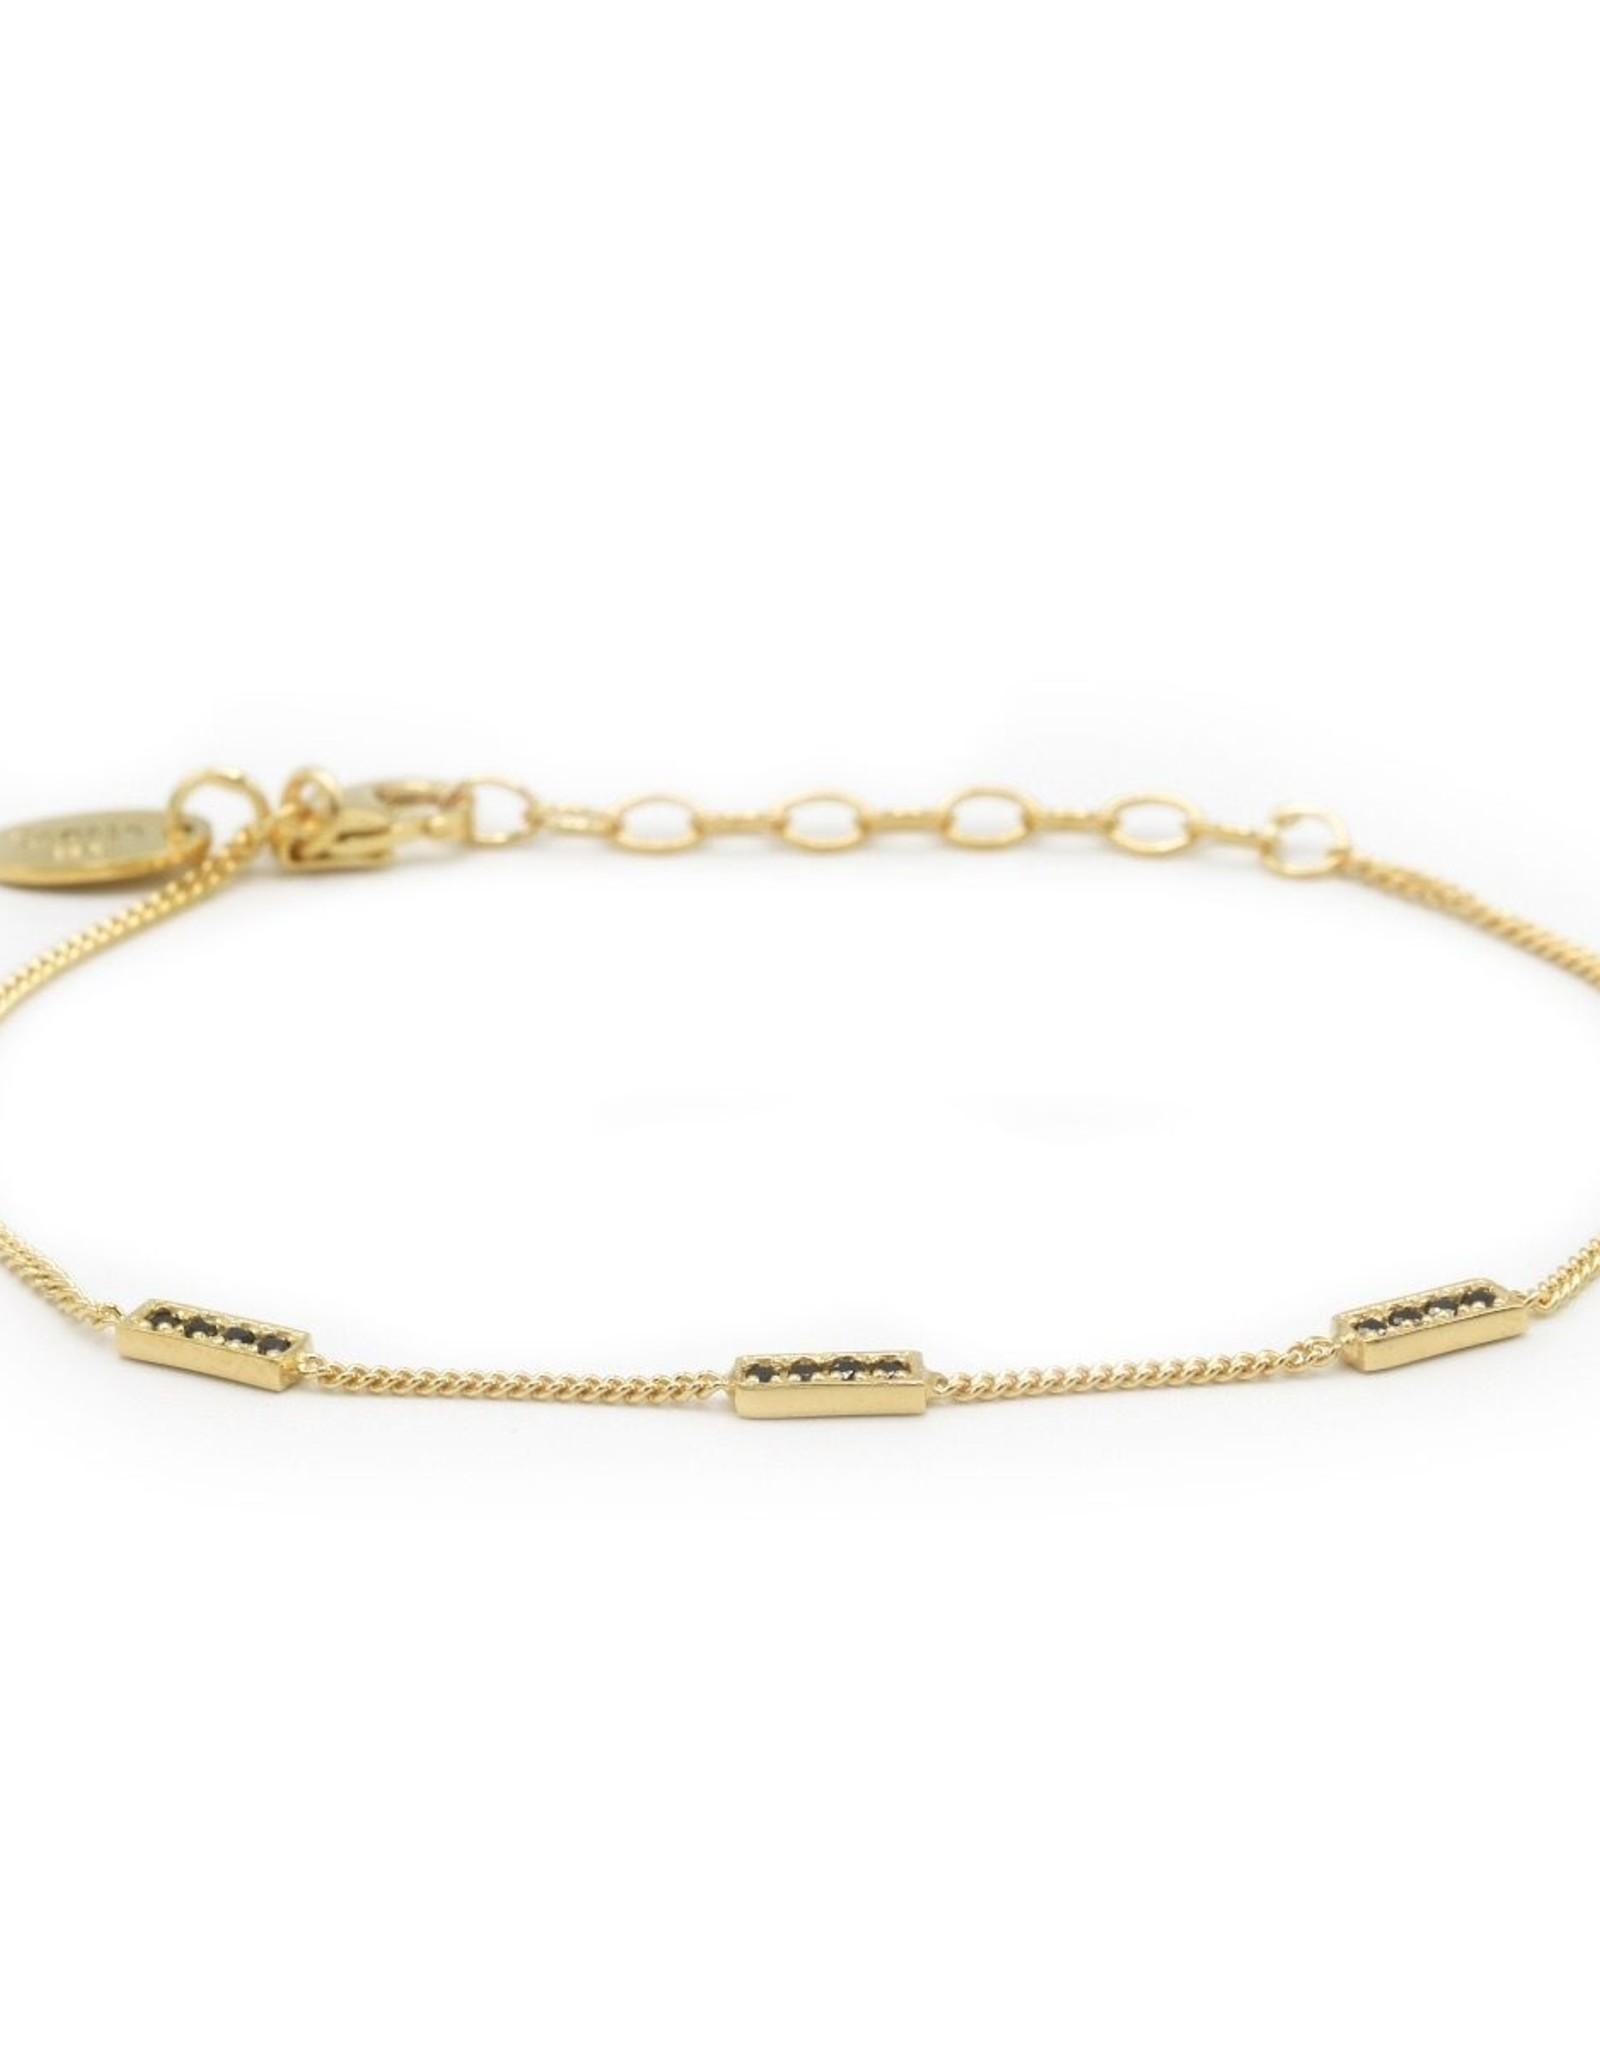 Karma Bracelet 3 Black Zirconia Rectangles Goldplated